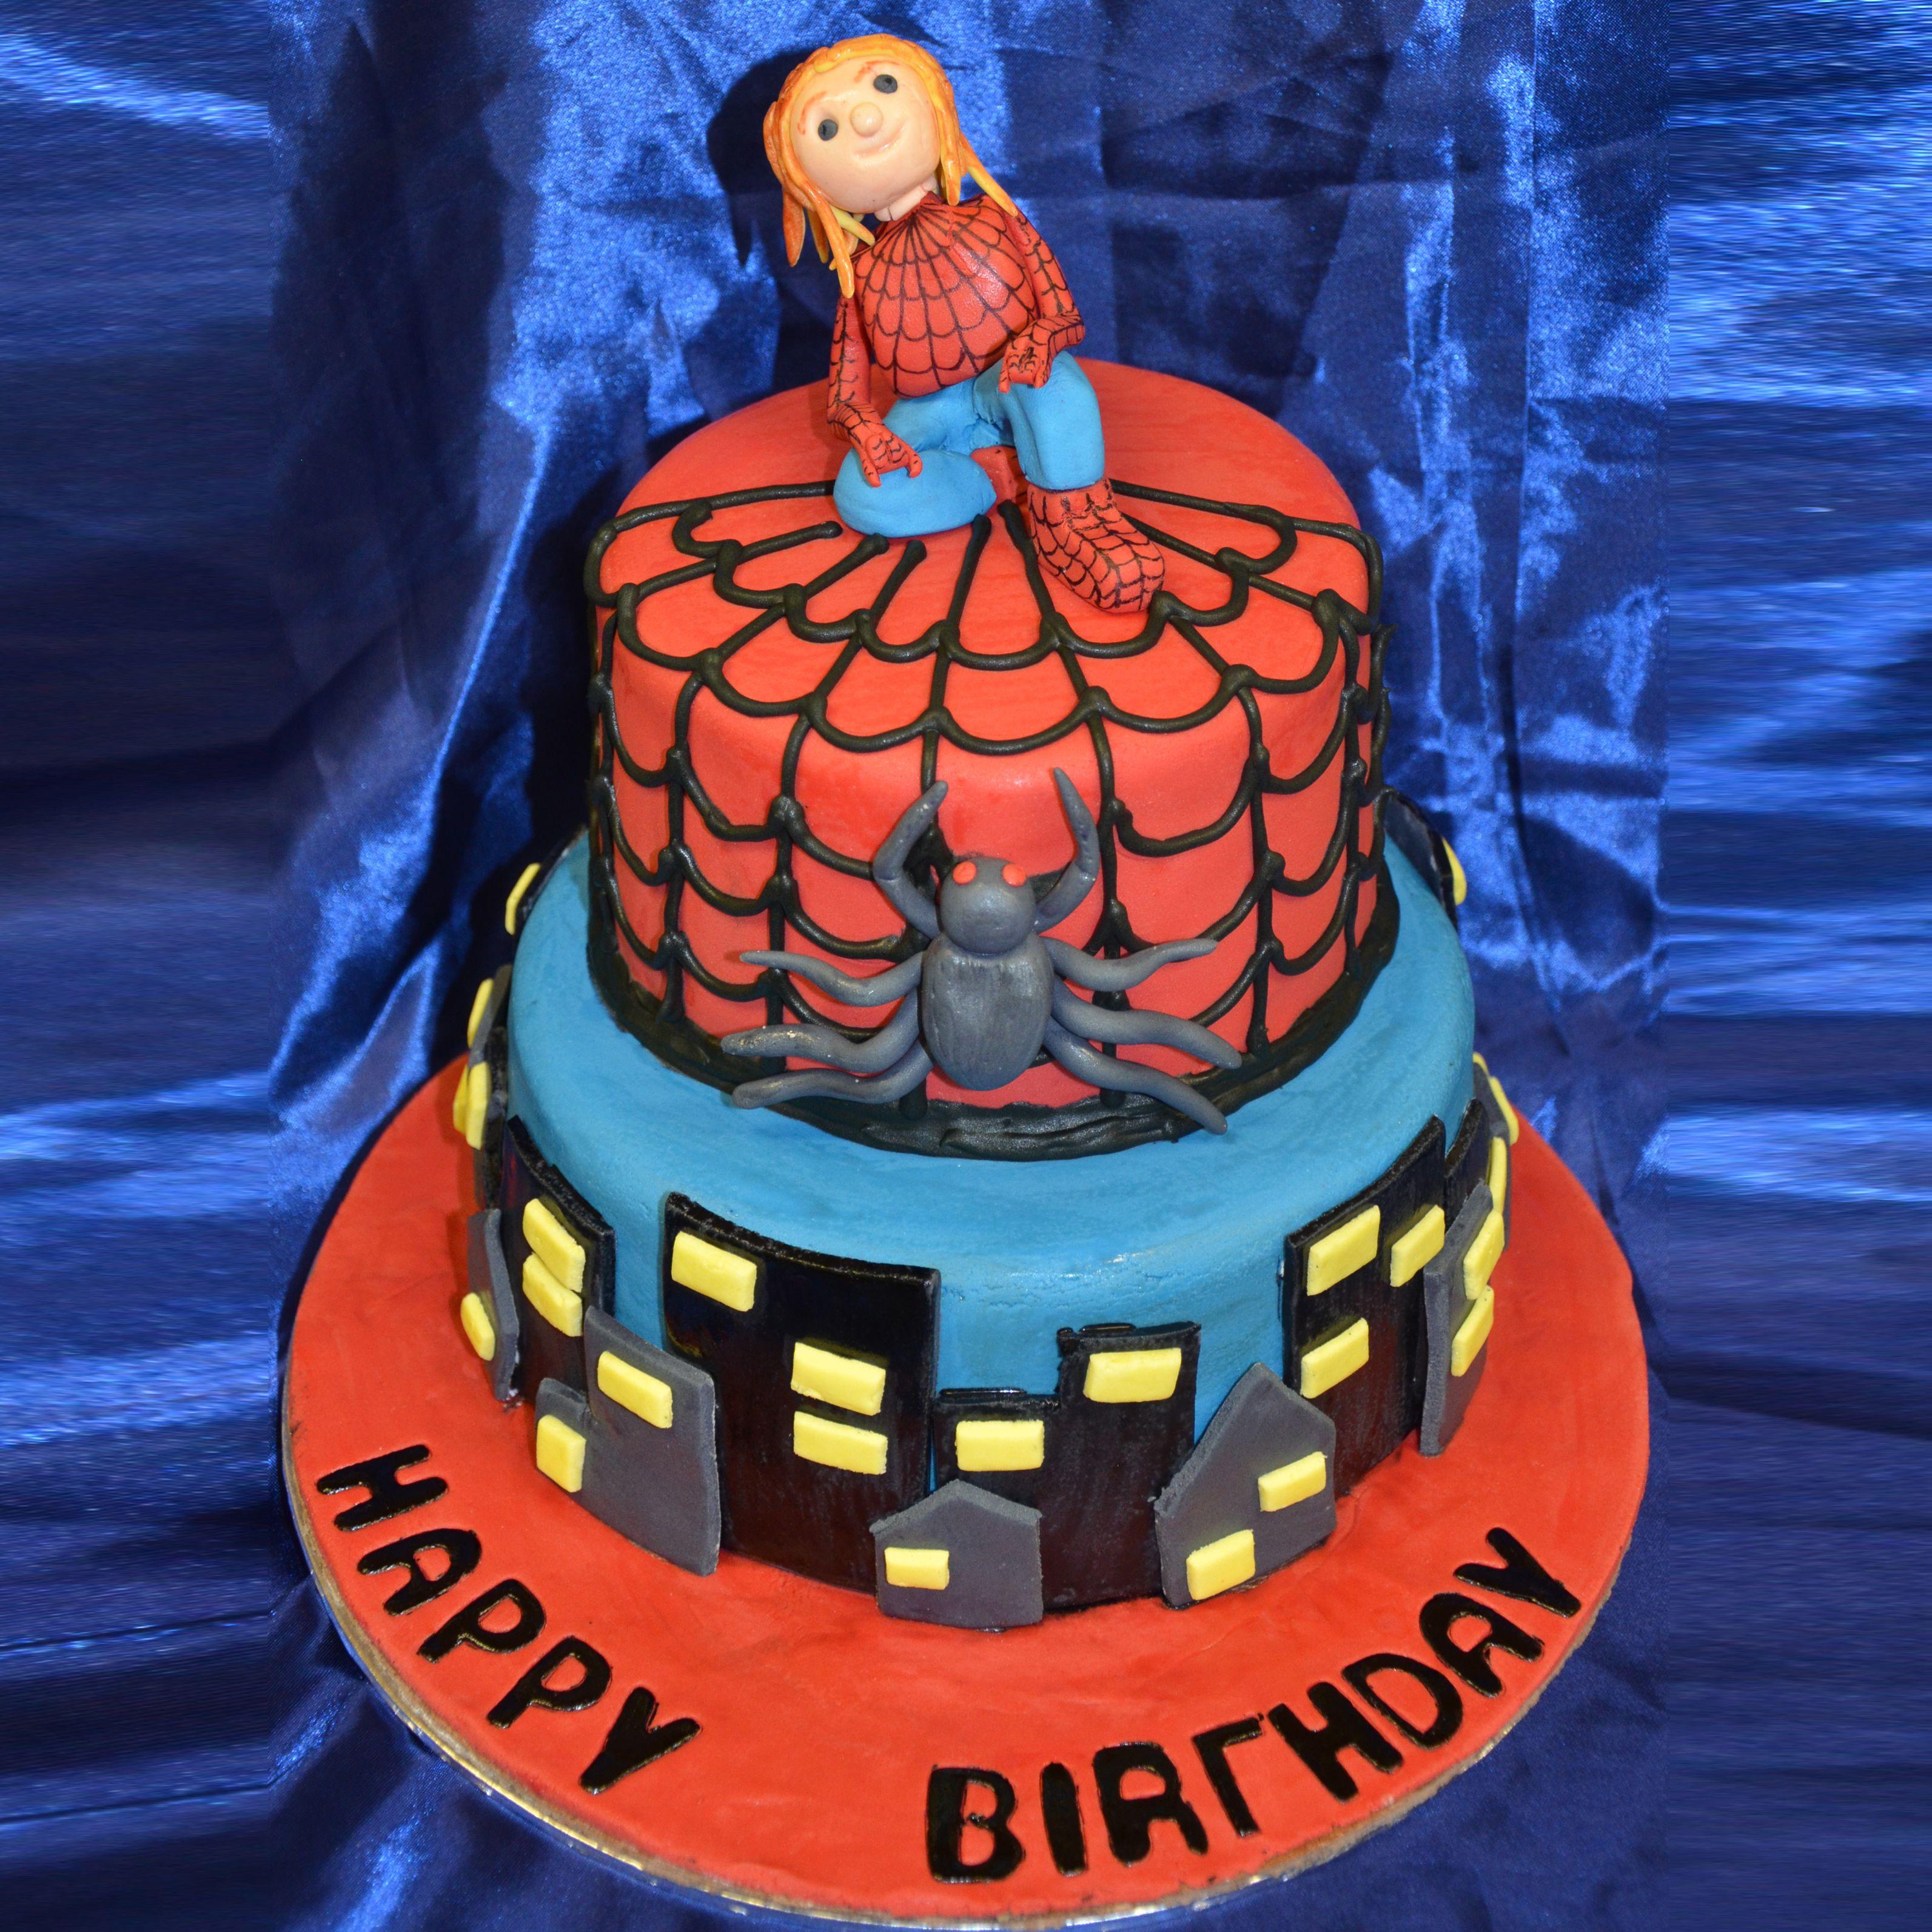 The Cake Artists - SpiderMan Cake